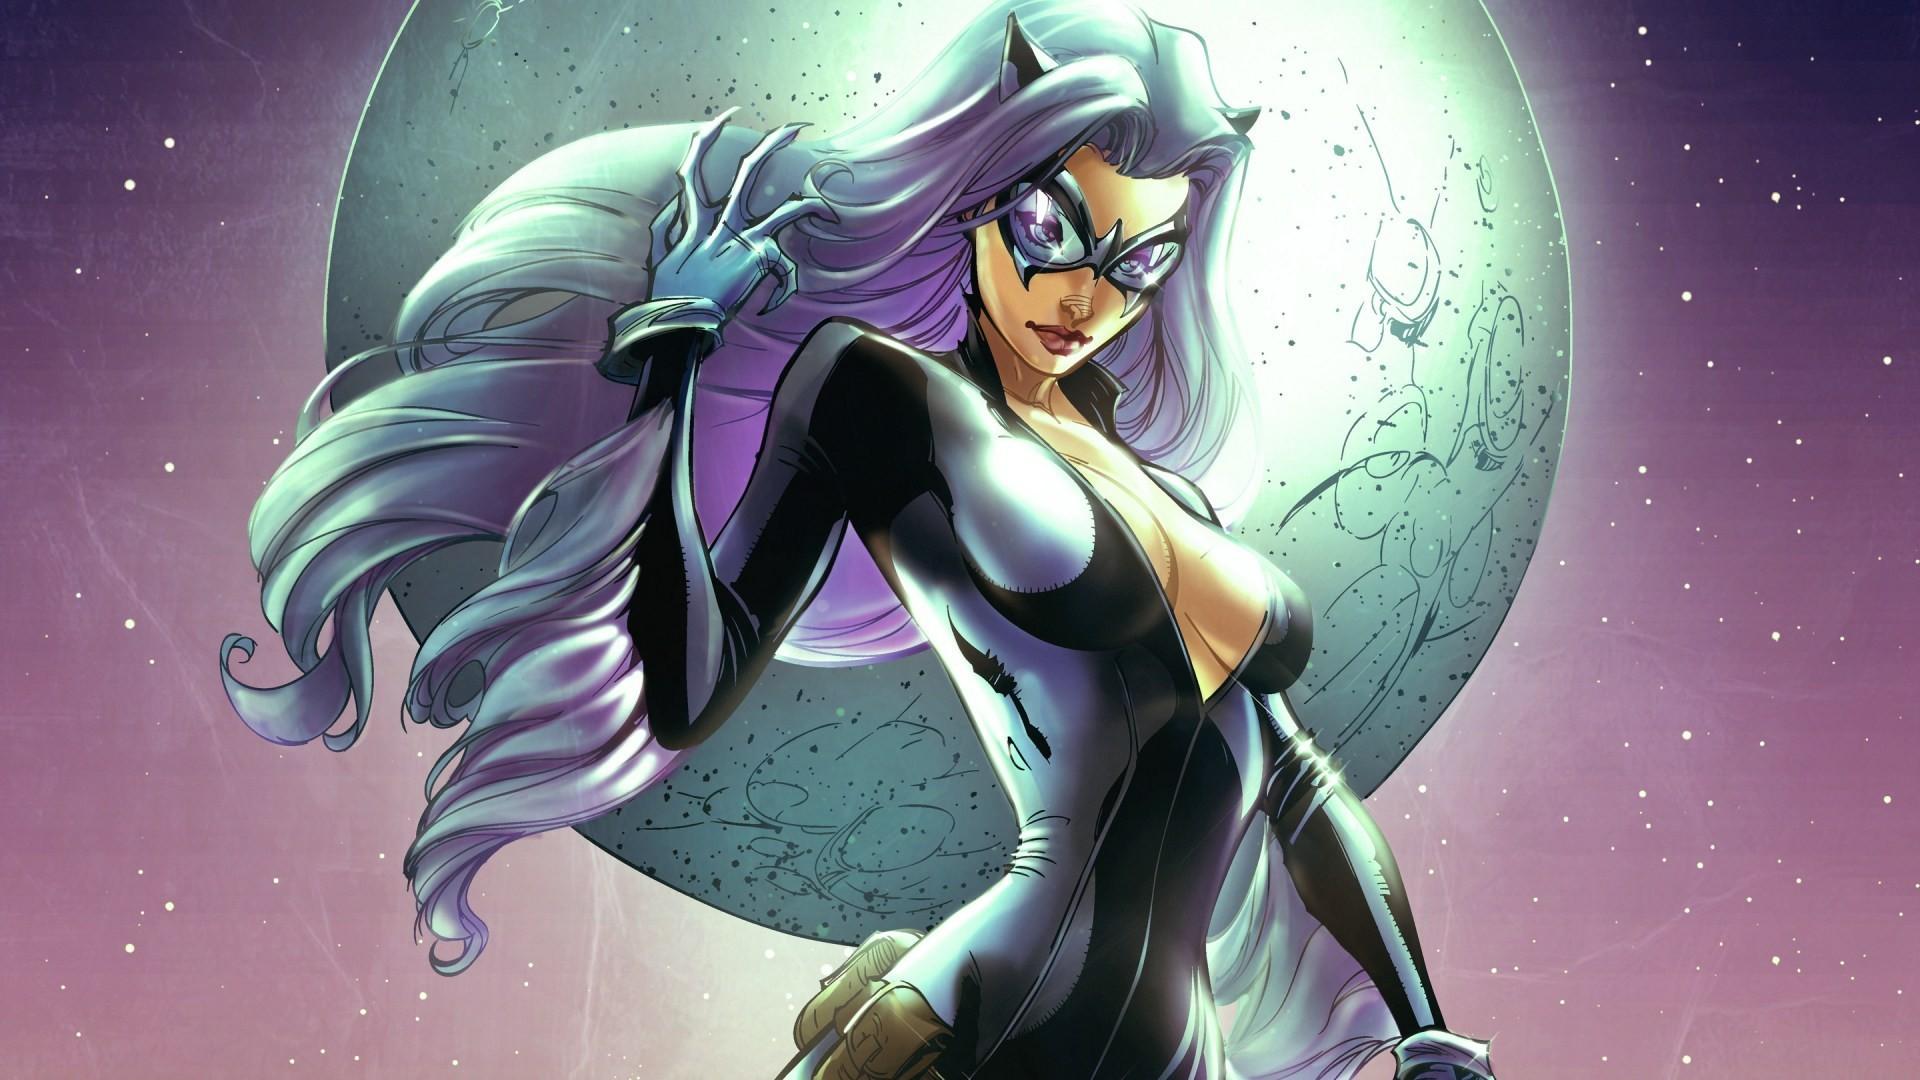 Res: 1920x1080, Marvel Felicia Hardy Black Cat (Marvel) 1080p HD Wallpaper Background